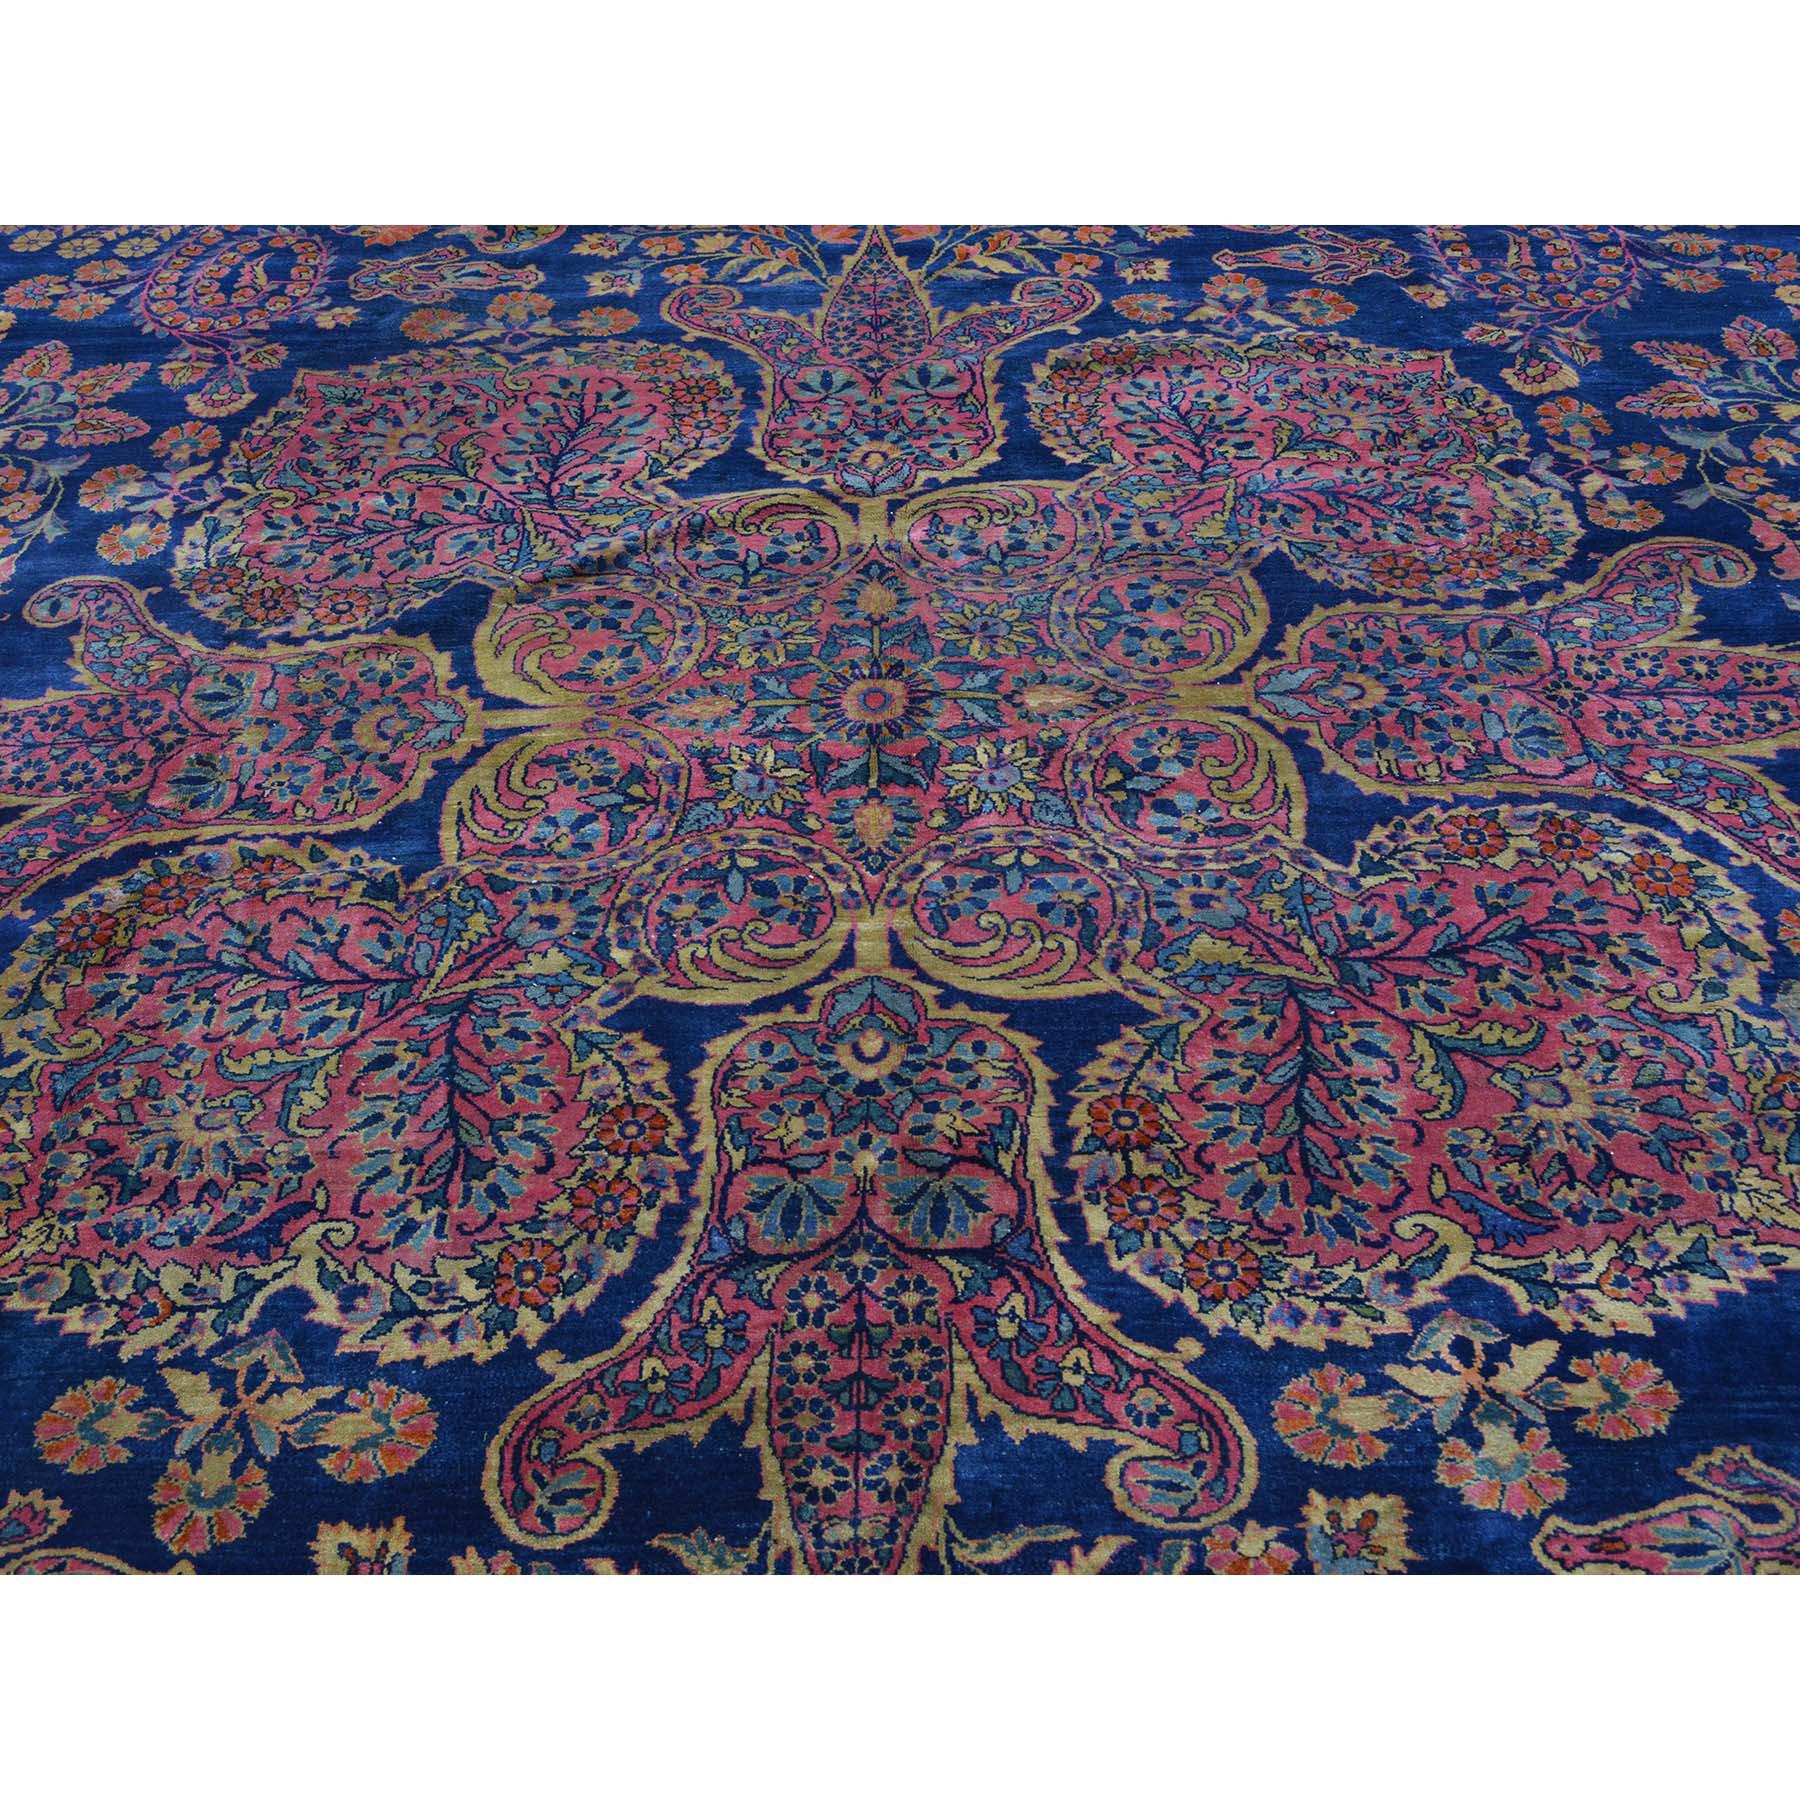 12-x17-8  Antique Persian Mohajeran Sarouk Oversize Rug